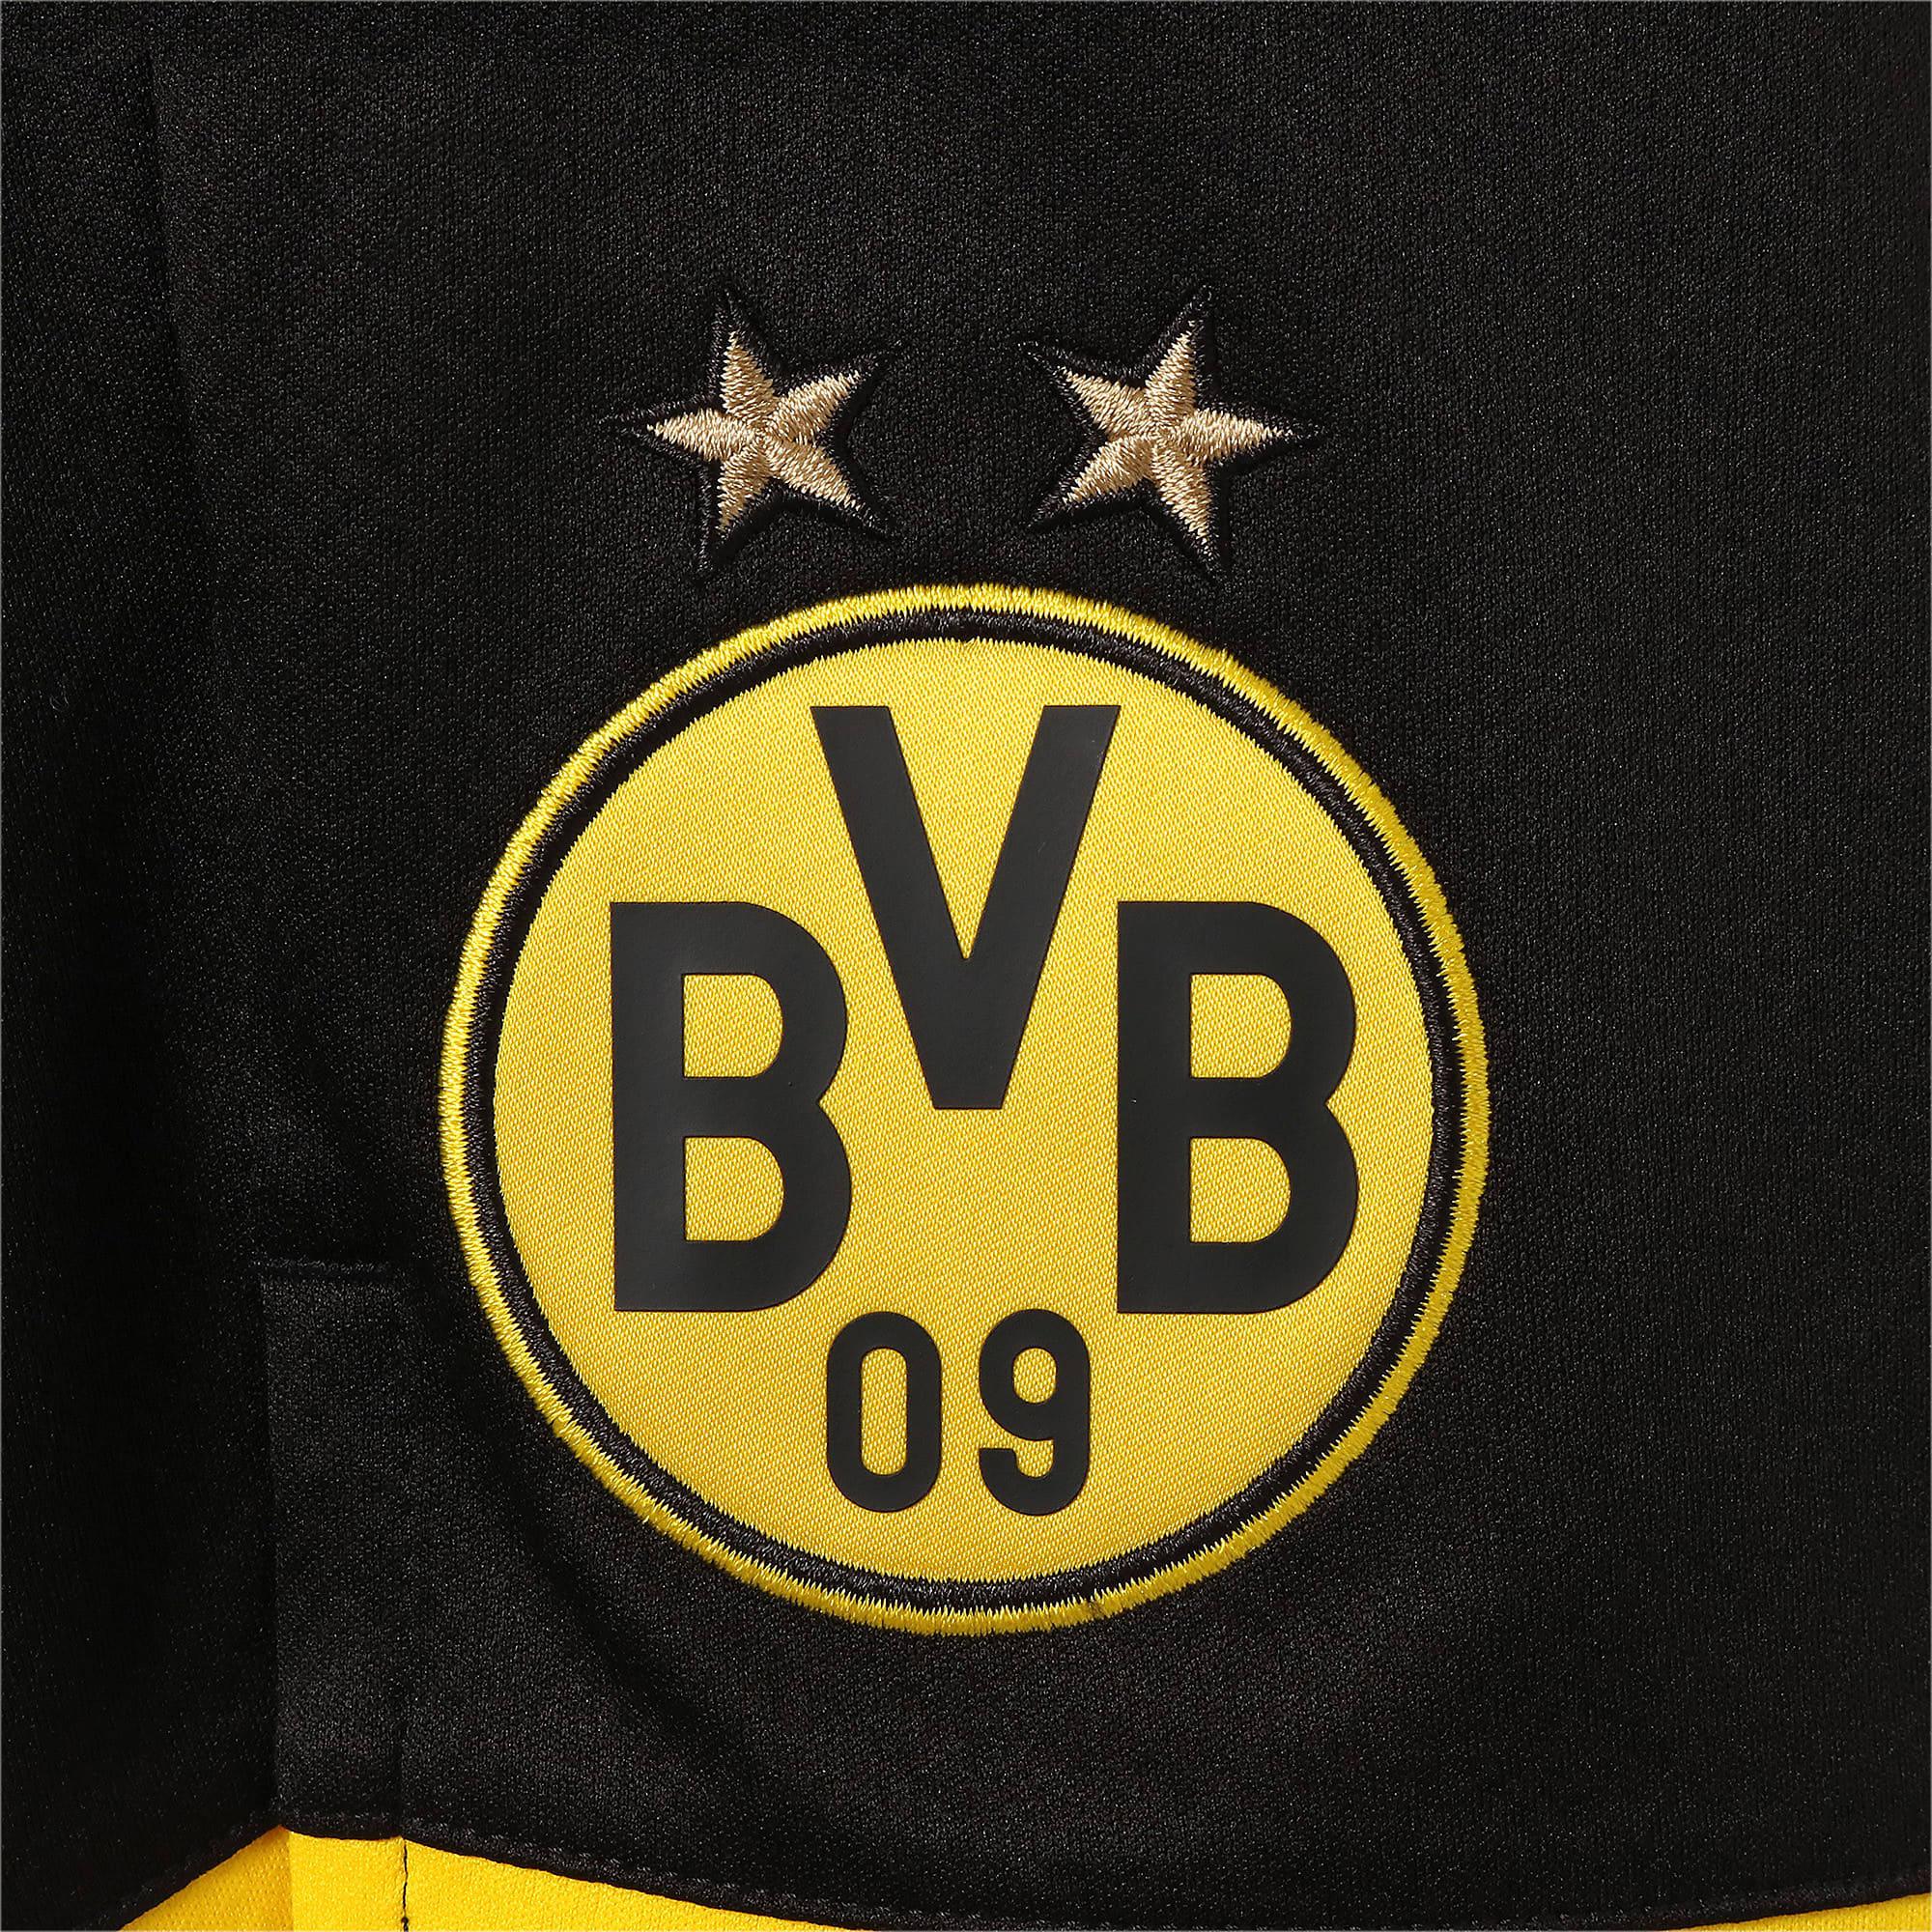 Thumbnail 8 of BVB レプリカショーツ, Puma Black-Cyber Yellow, medium-JPN